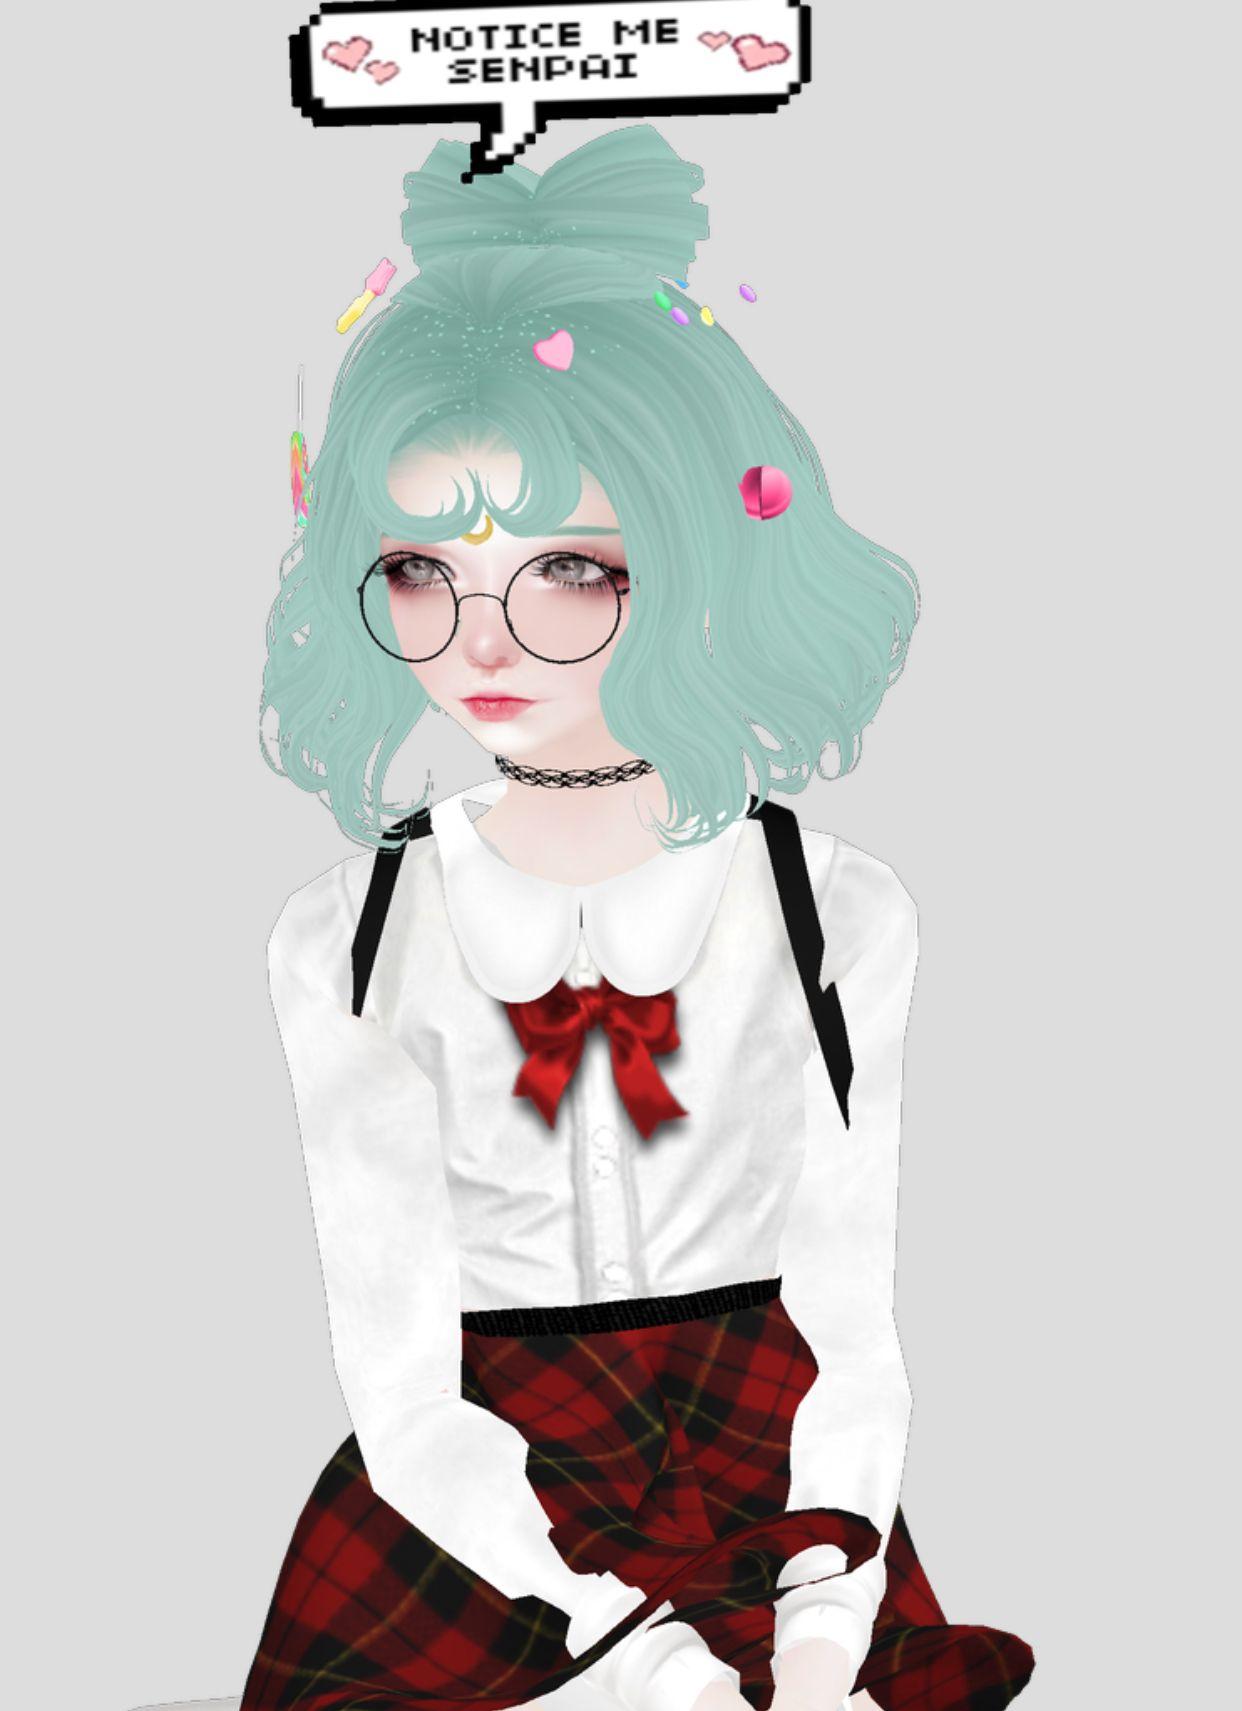 Pin by Rebecca Hopple on design stuff Kawaii anime girl